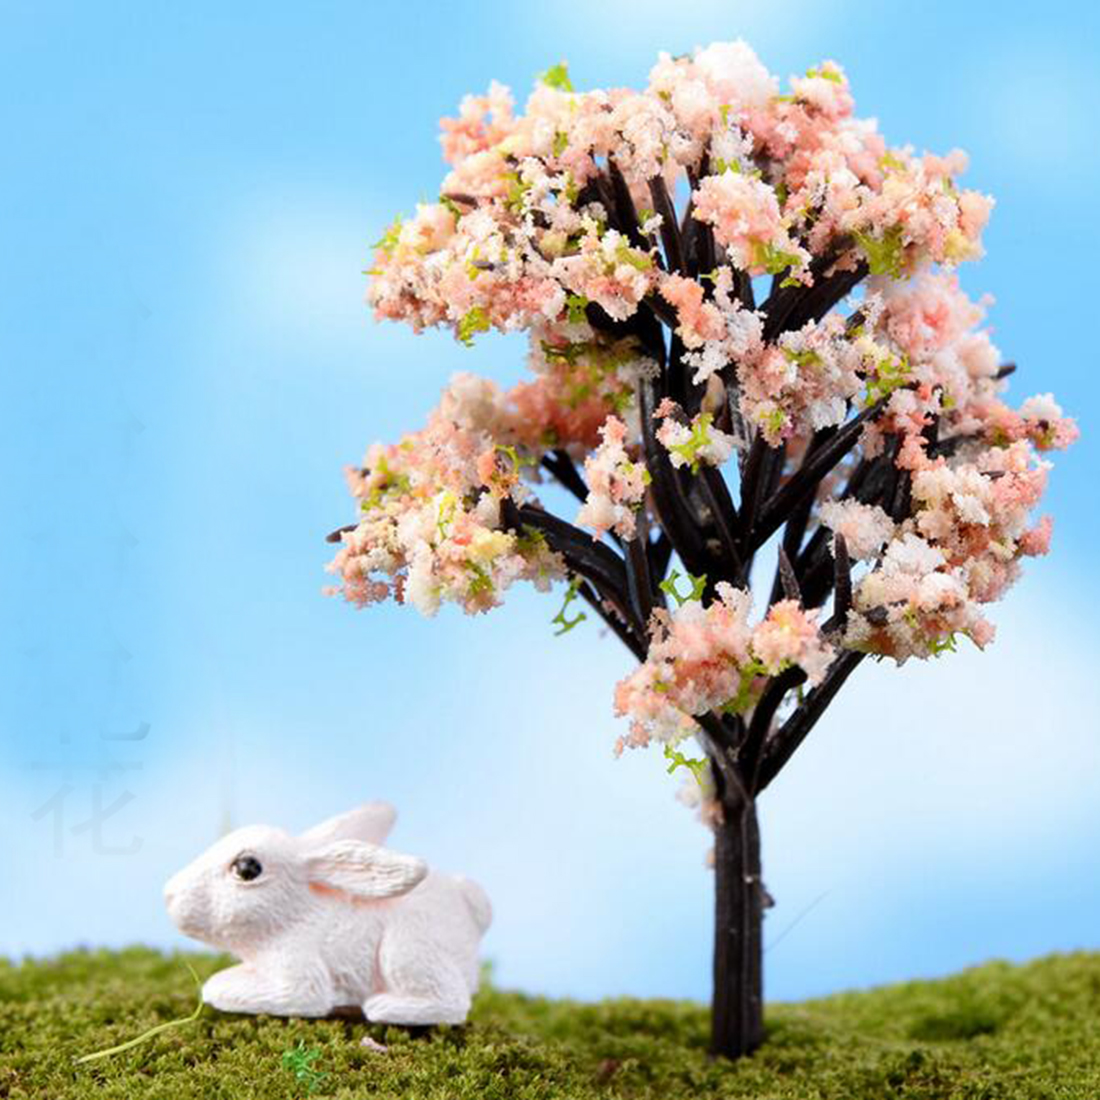 Mini Home Decor Micro World Bonsai Garden Small Ornament Landscape Decoration Resin Crafts Simulation Tree Flower